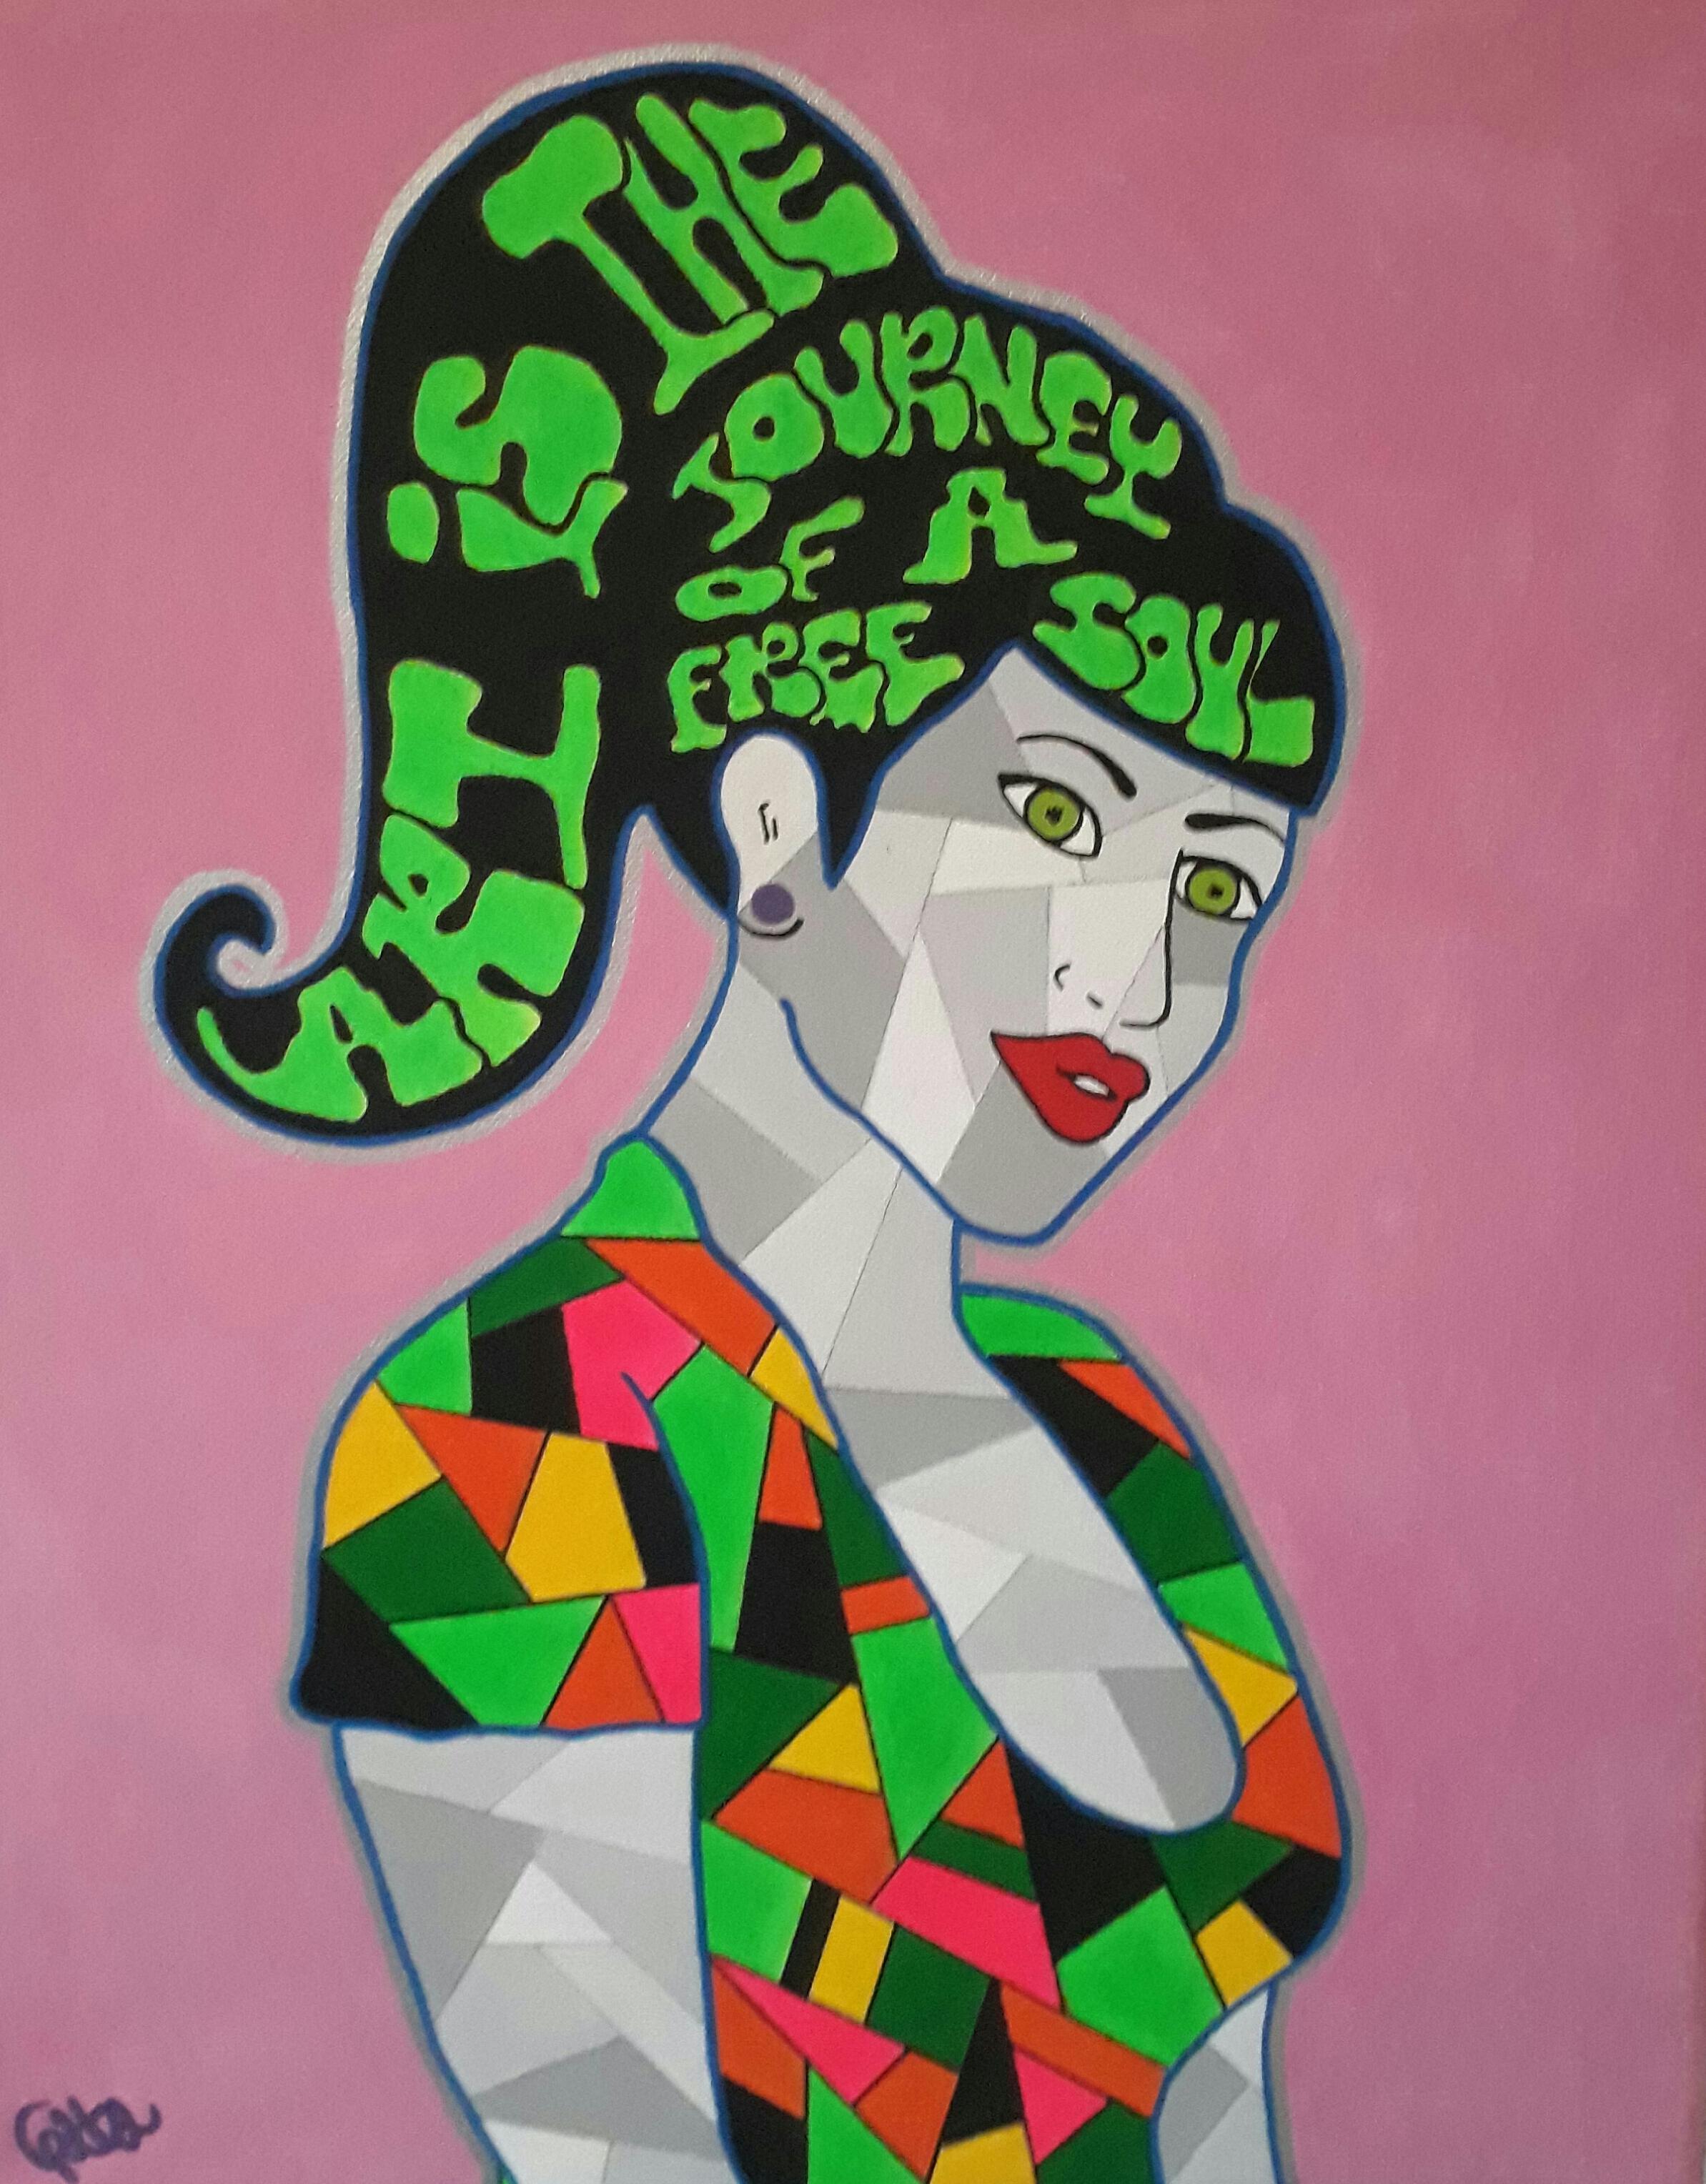 Cubic free Soul